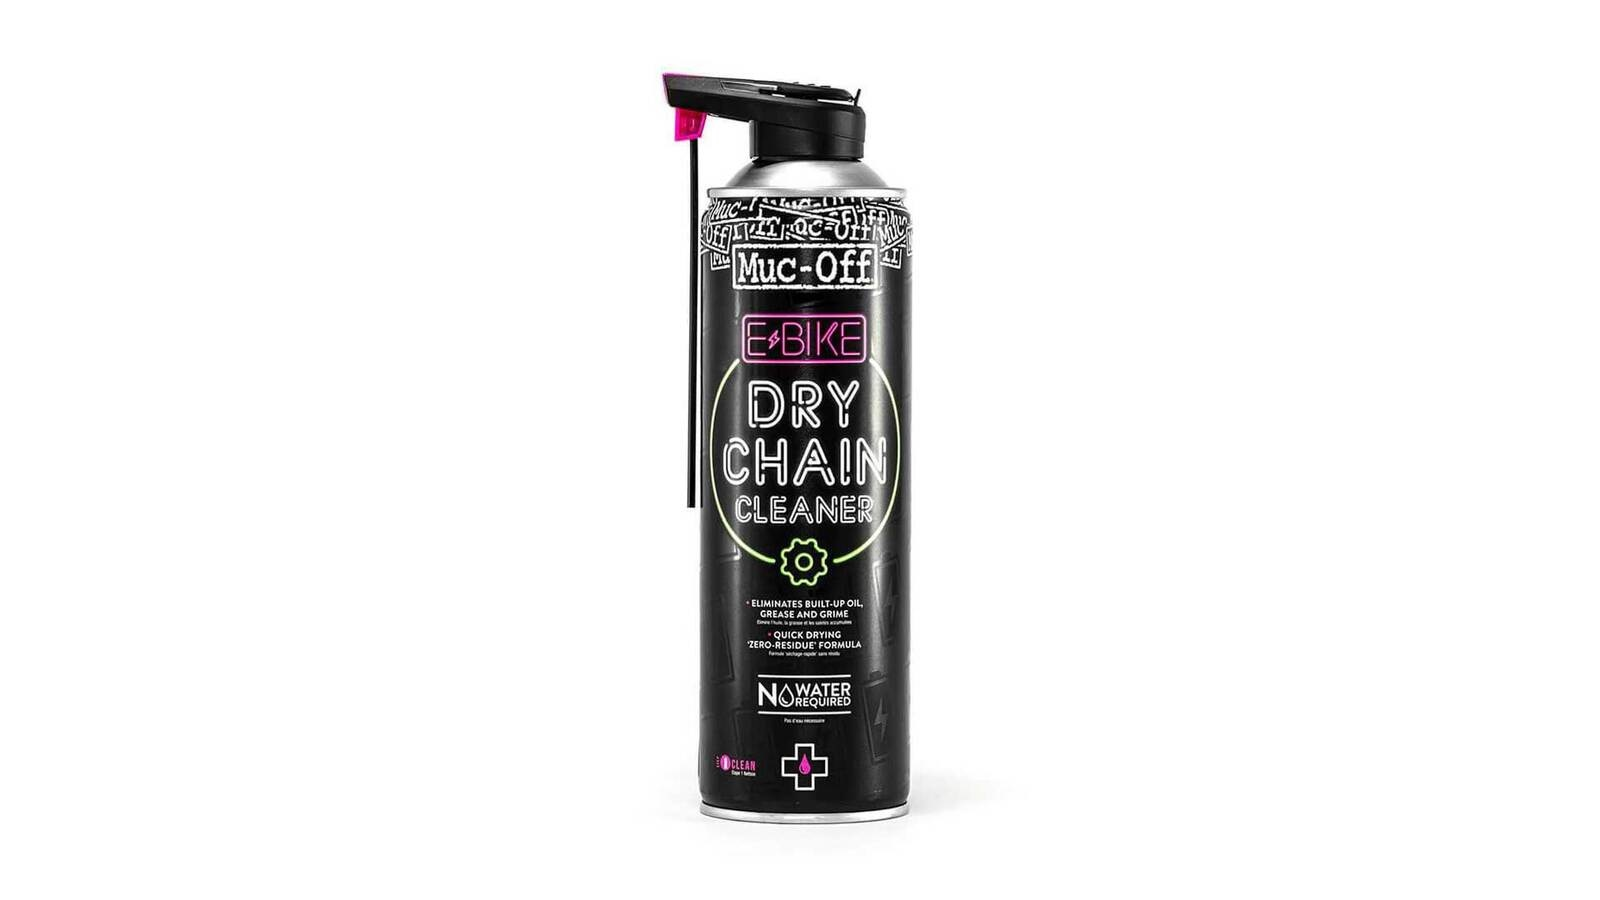 Muc-Off Muc-Off eBike Dry Chain Cleaner 500mm